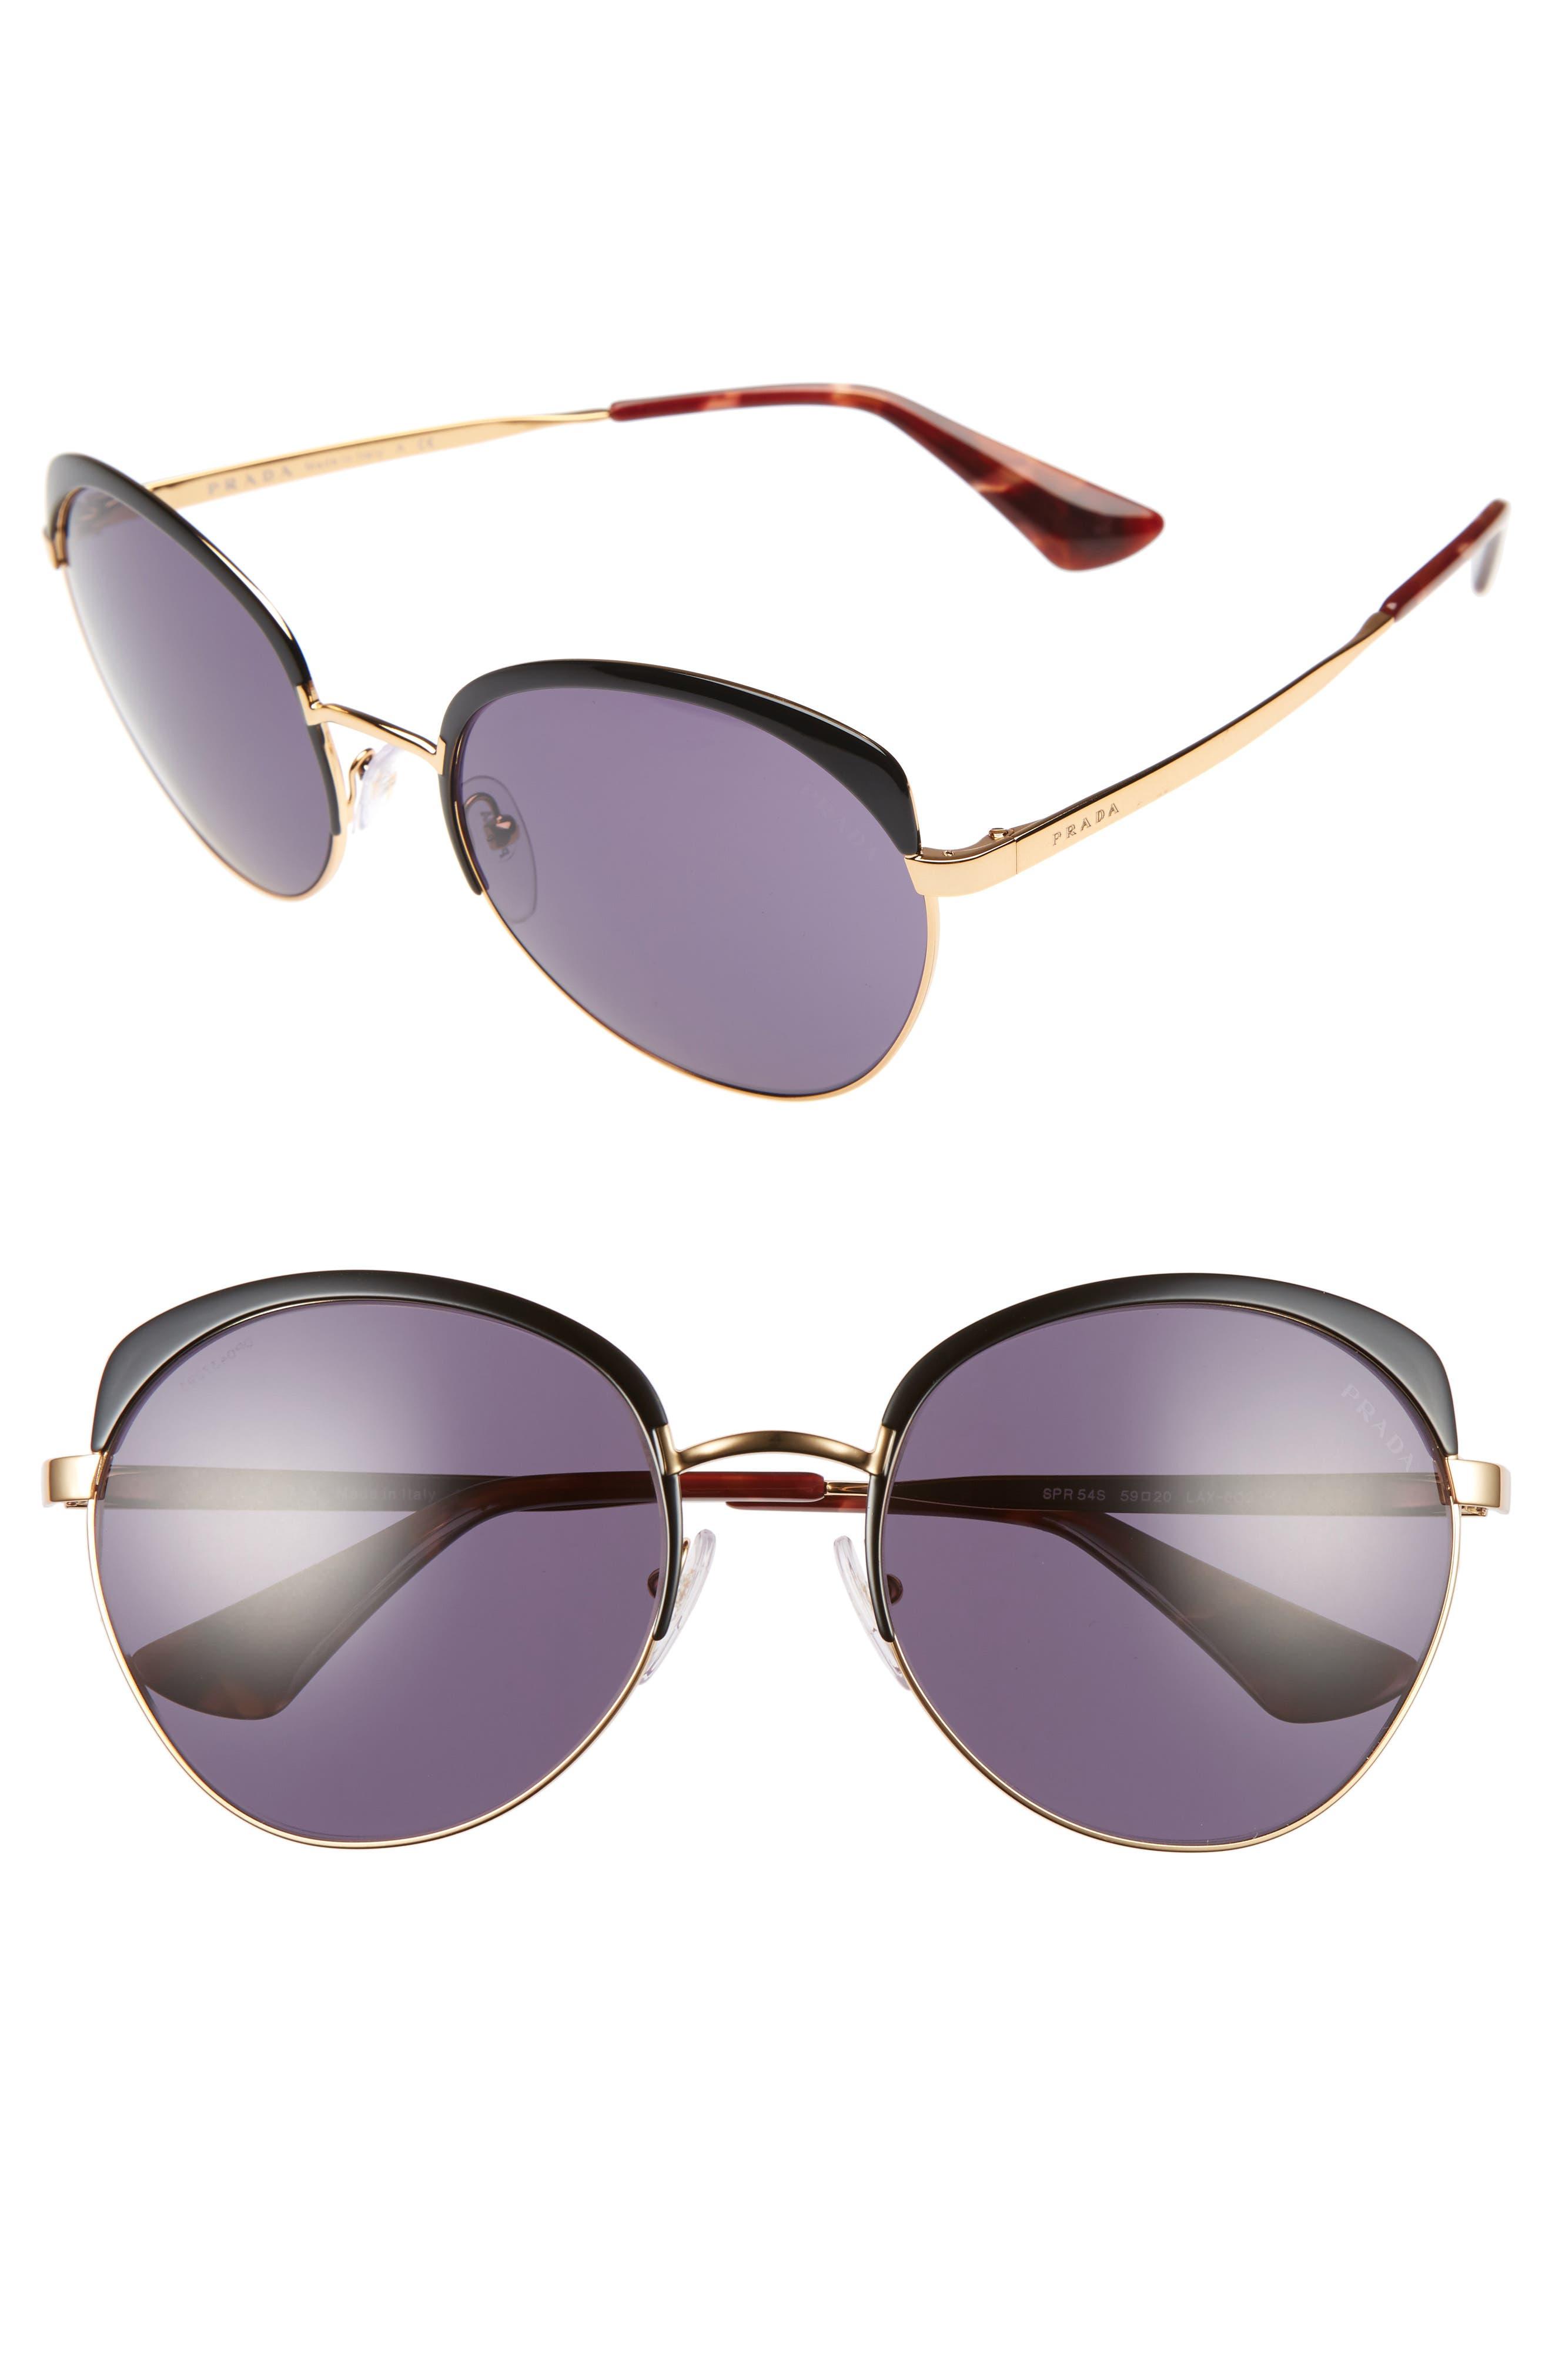 59mm Sunglasses,                             Main thumbnail 1, color,                             Black/ Gold